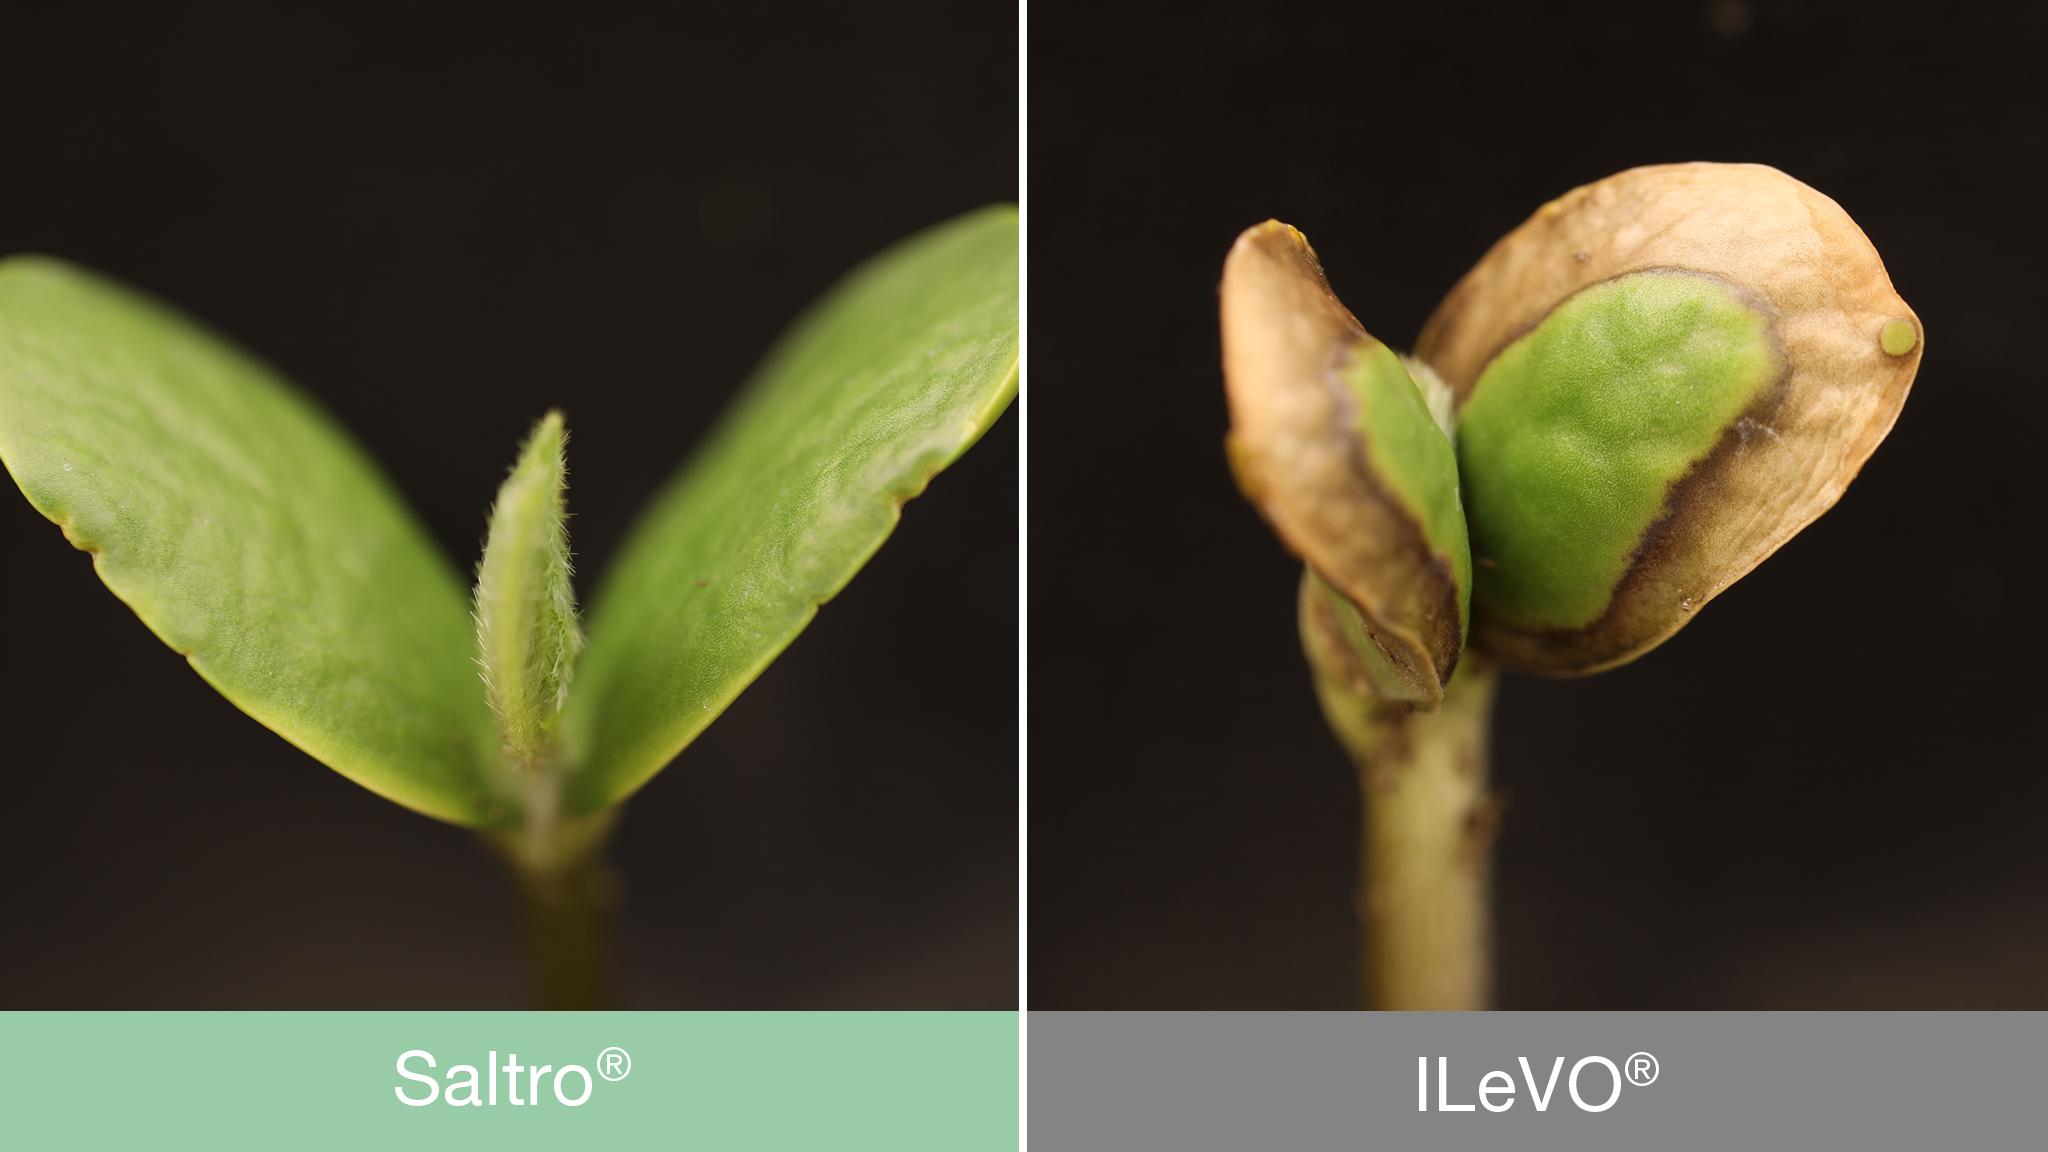 Syngenta announced newest seed treatment | Syngenta US